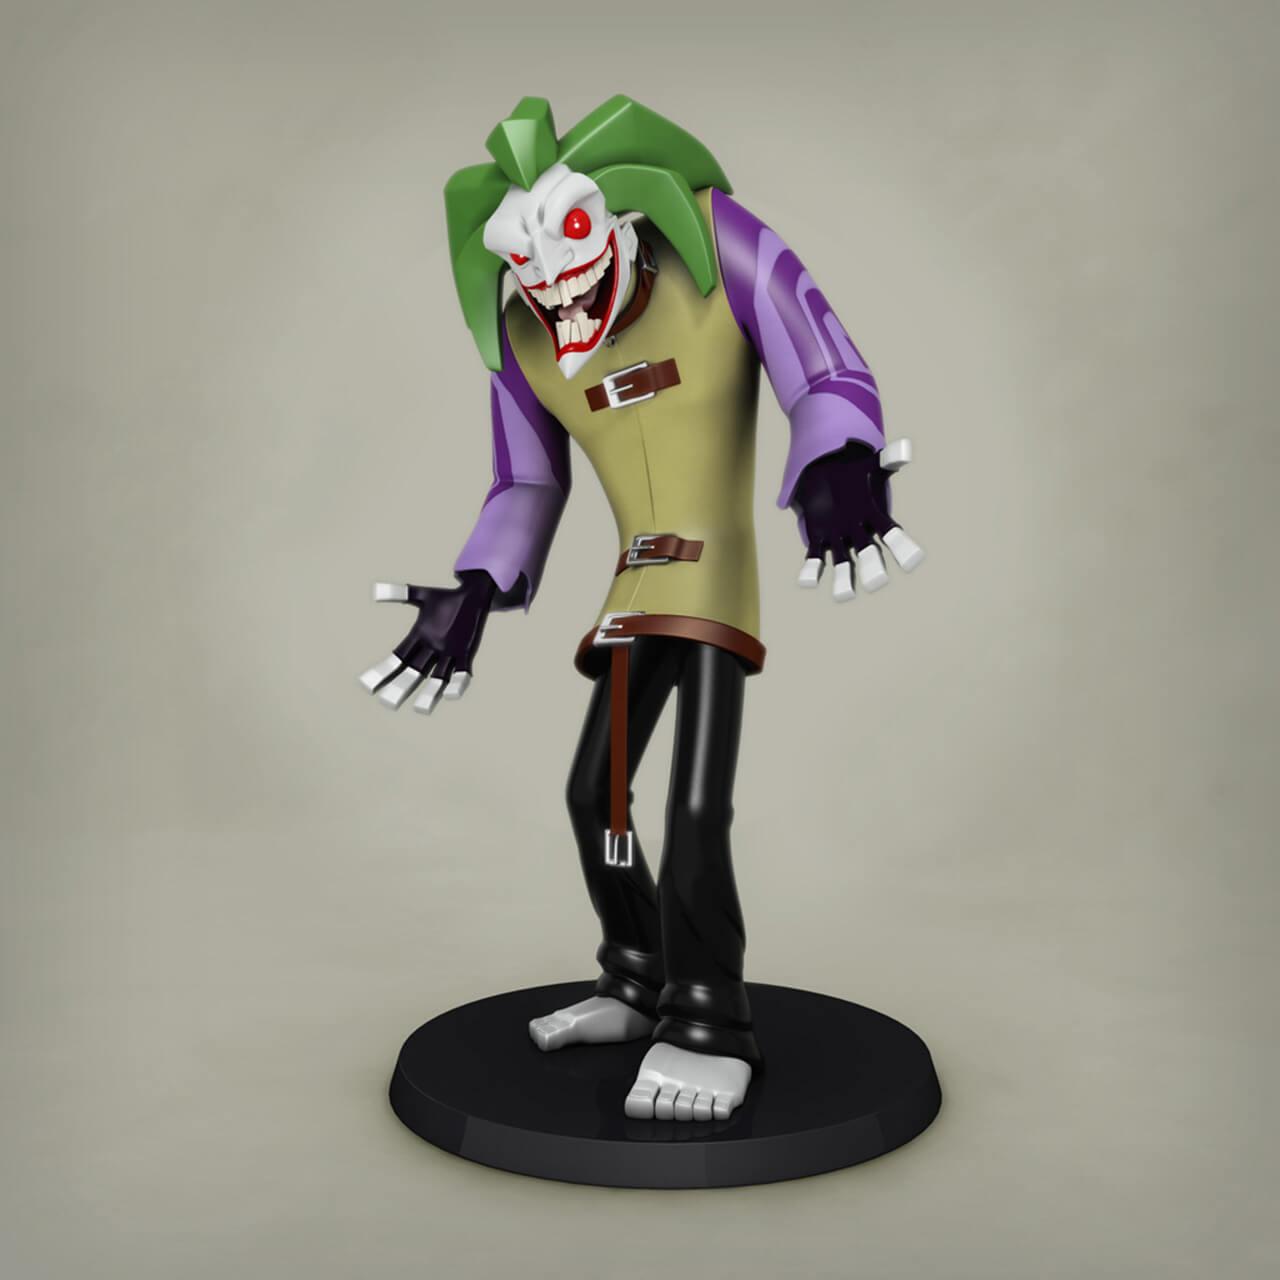 Image of joker converted using ImgCvt